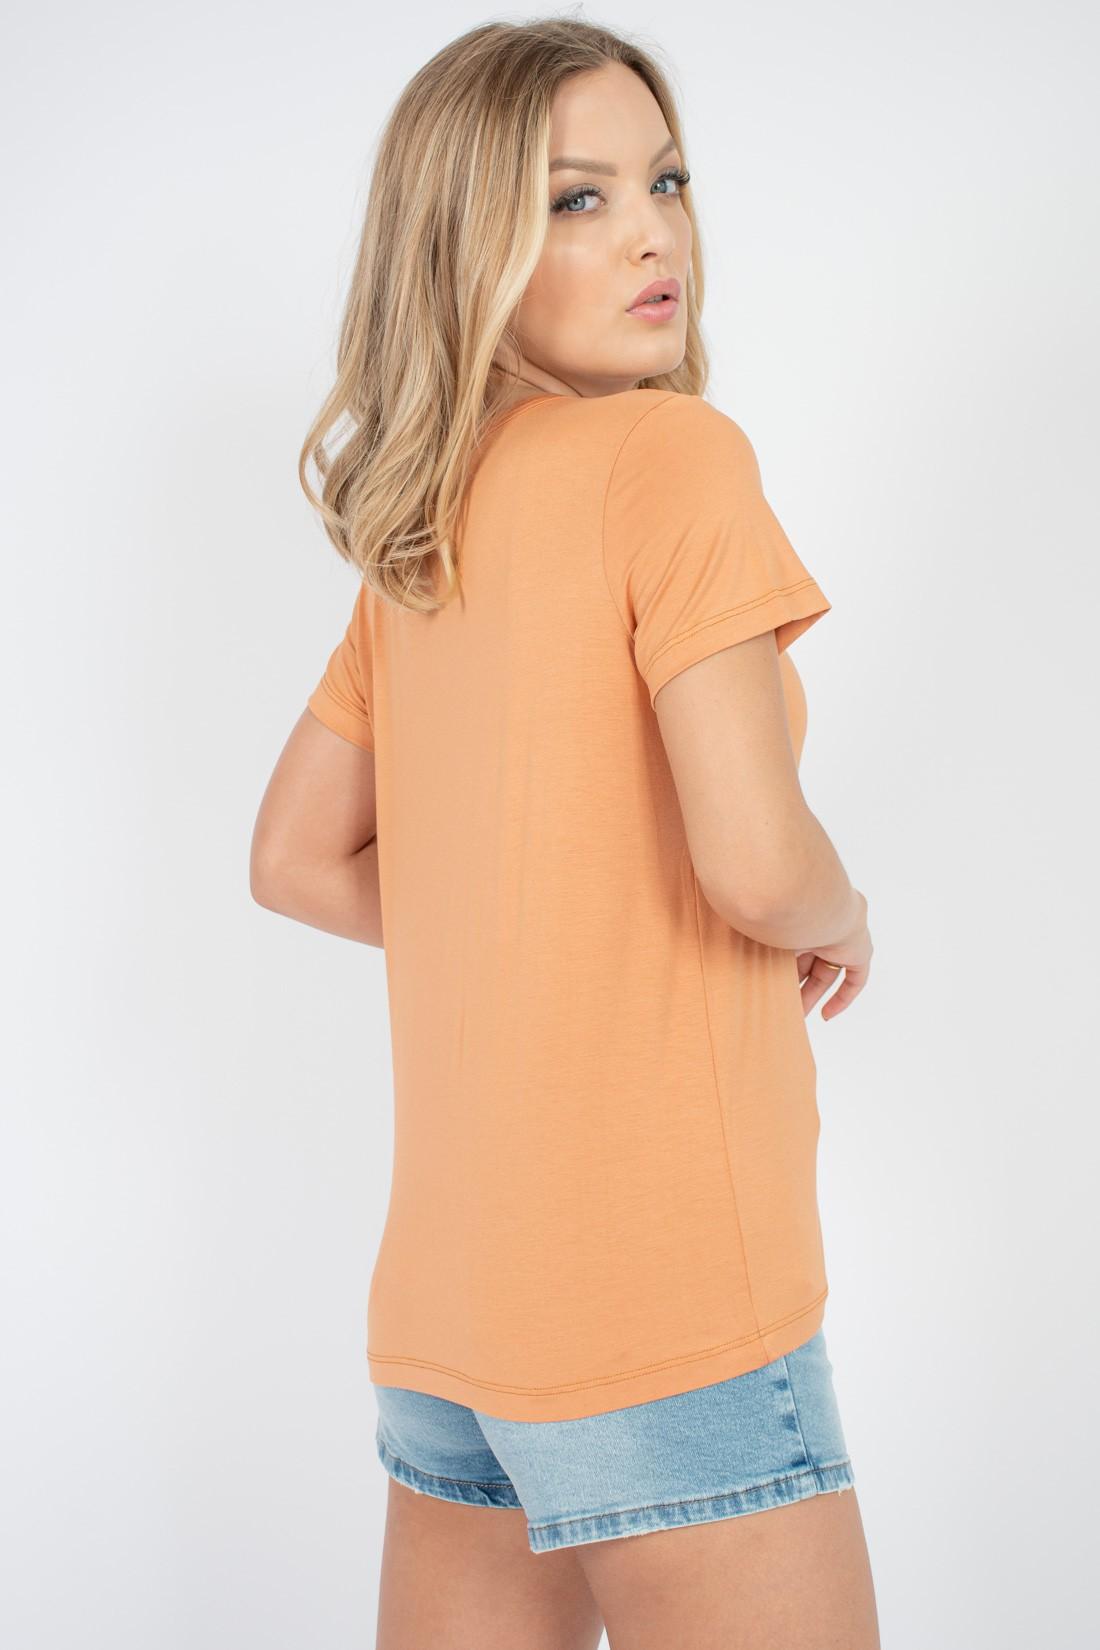 T Shirt Colcci Free Yourself